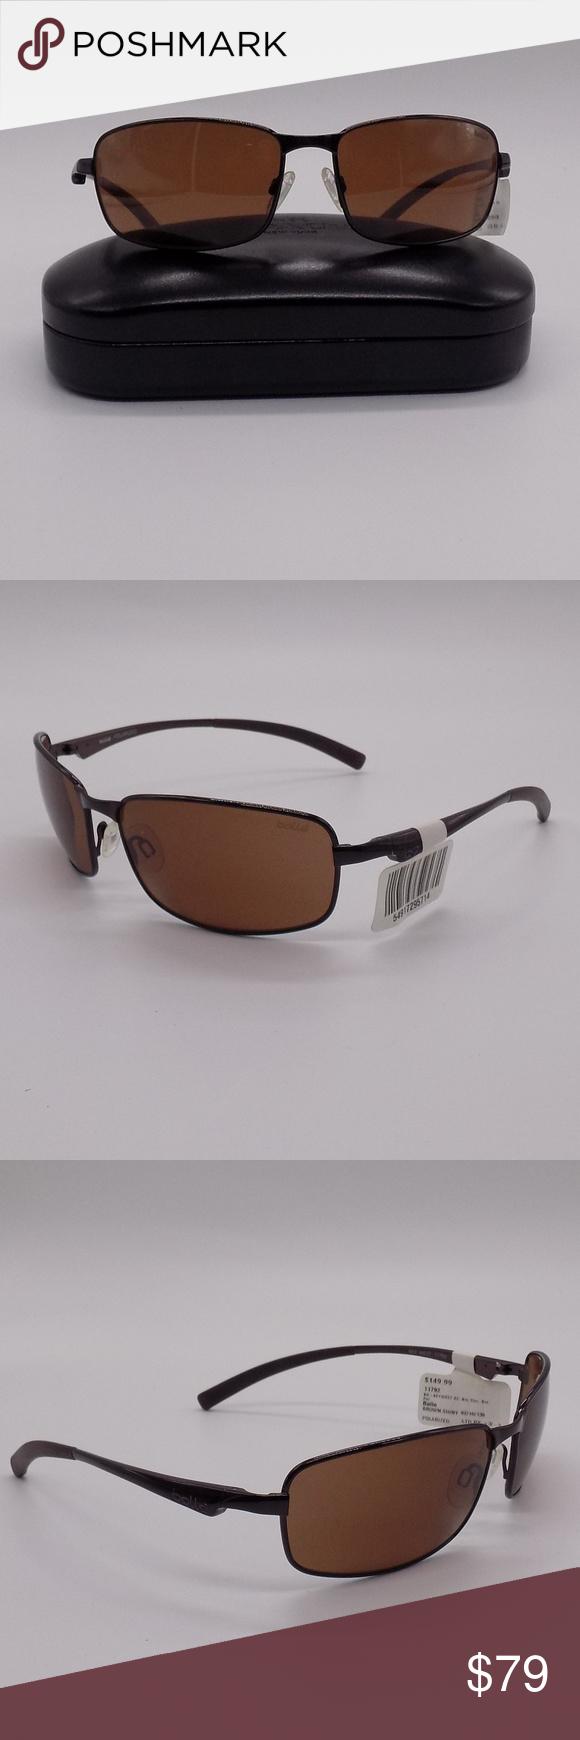 8cbaa45d48 Bolle Key West 11792 PLRZD Unisex Sunglasses Italy Bolle Key West 11792  Polarized Unisex Sunglasses Made